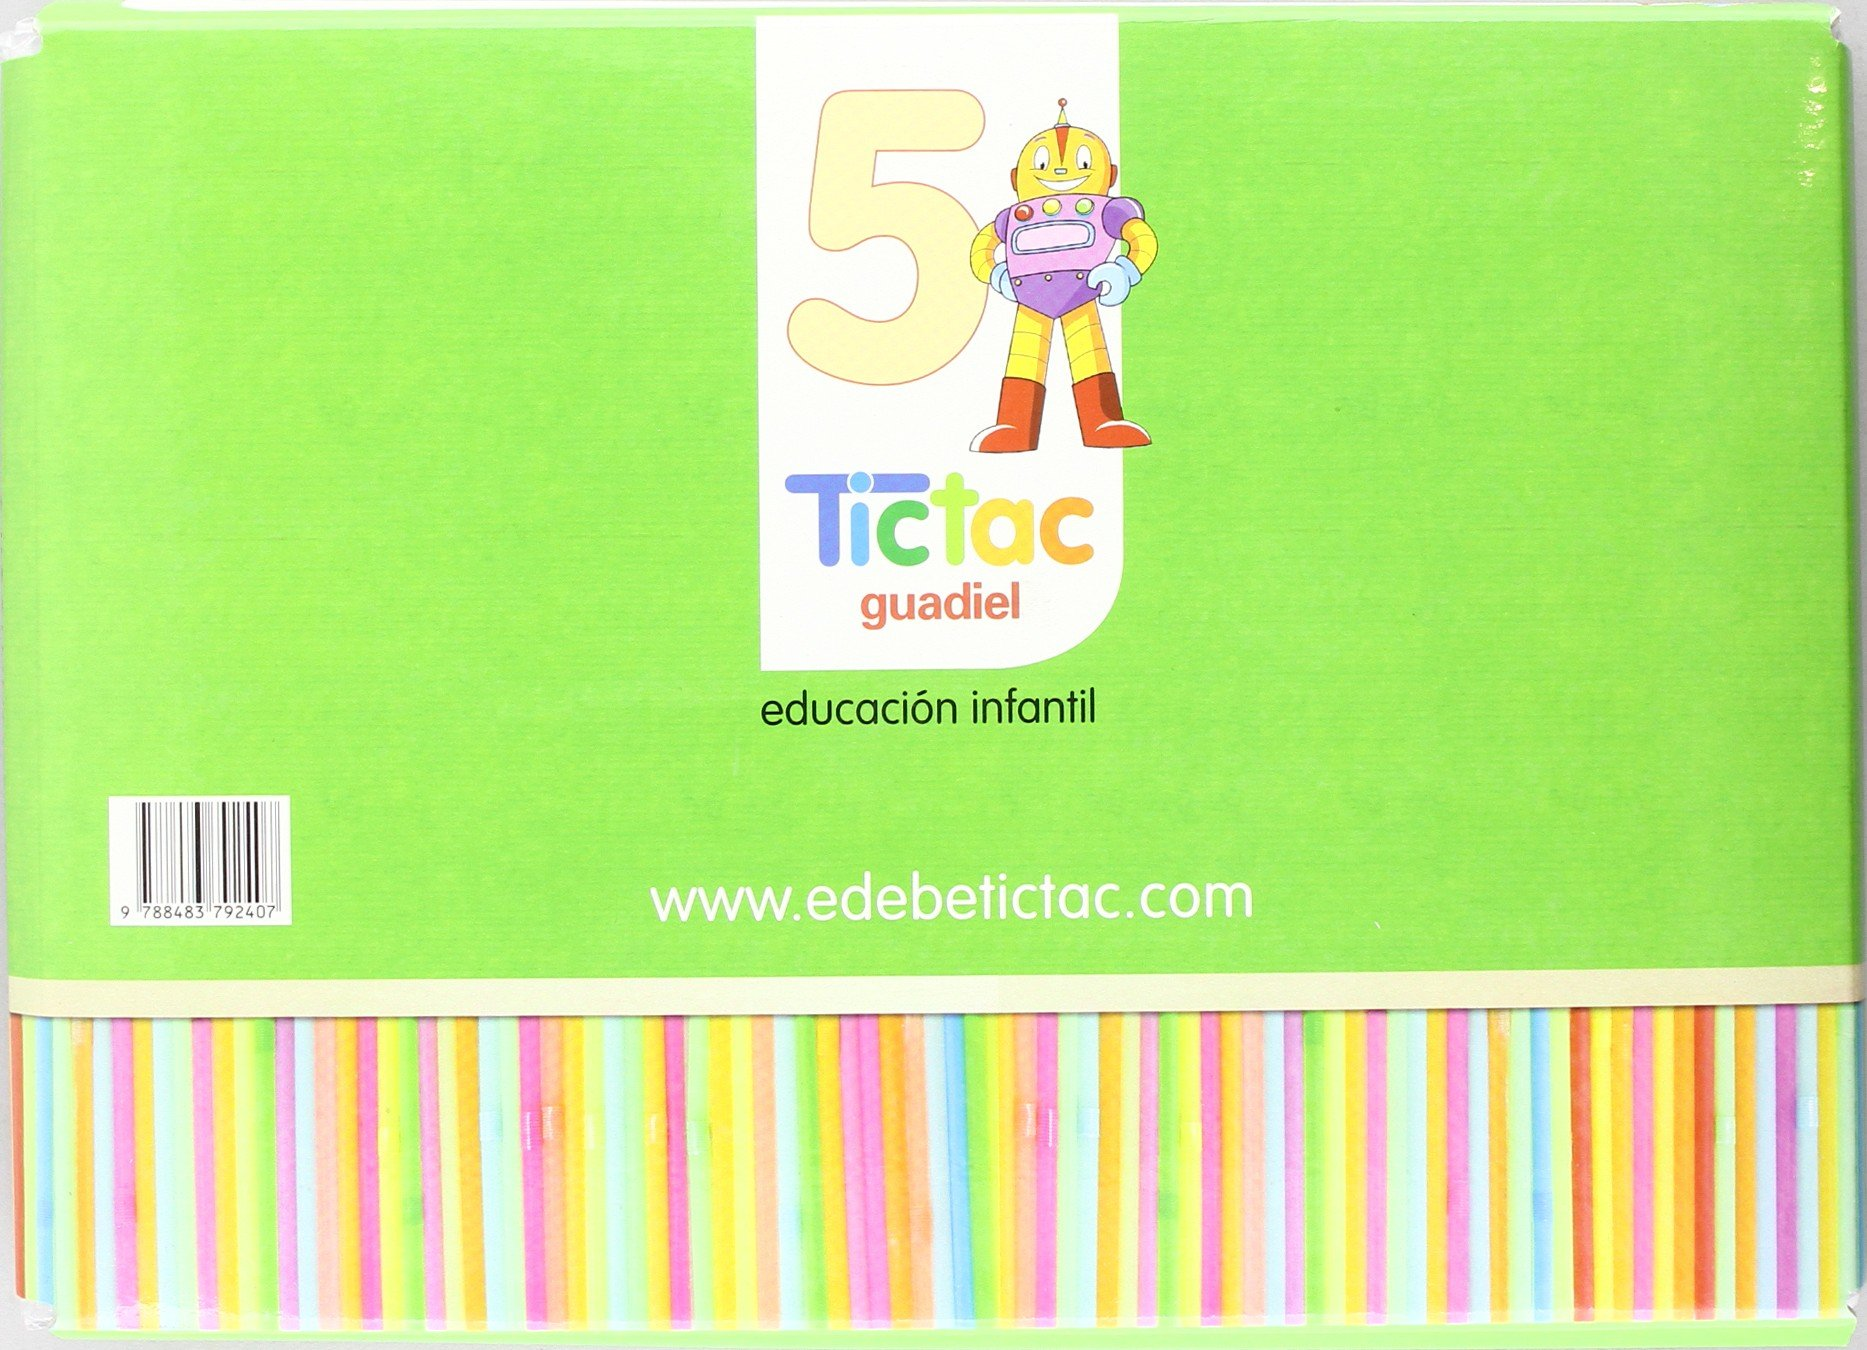 TIC TAC 5 AÑOS PRIMER TRIMESTRE: Obra Colectiva Edebé: 9788483792407: Amazon.com: Books